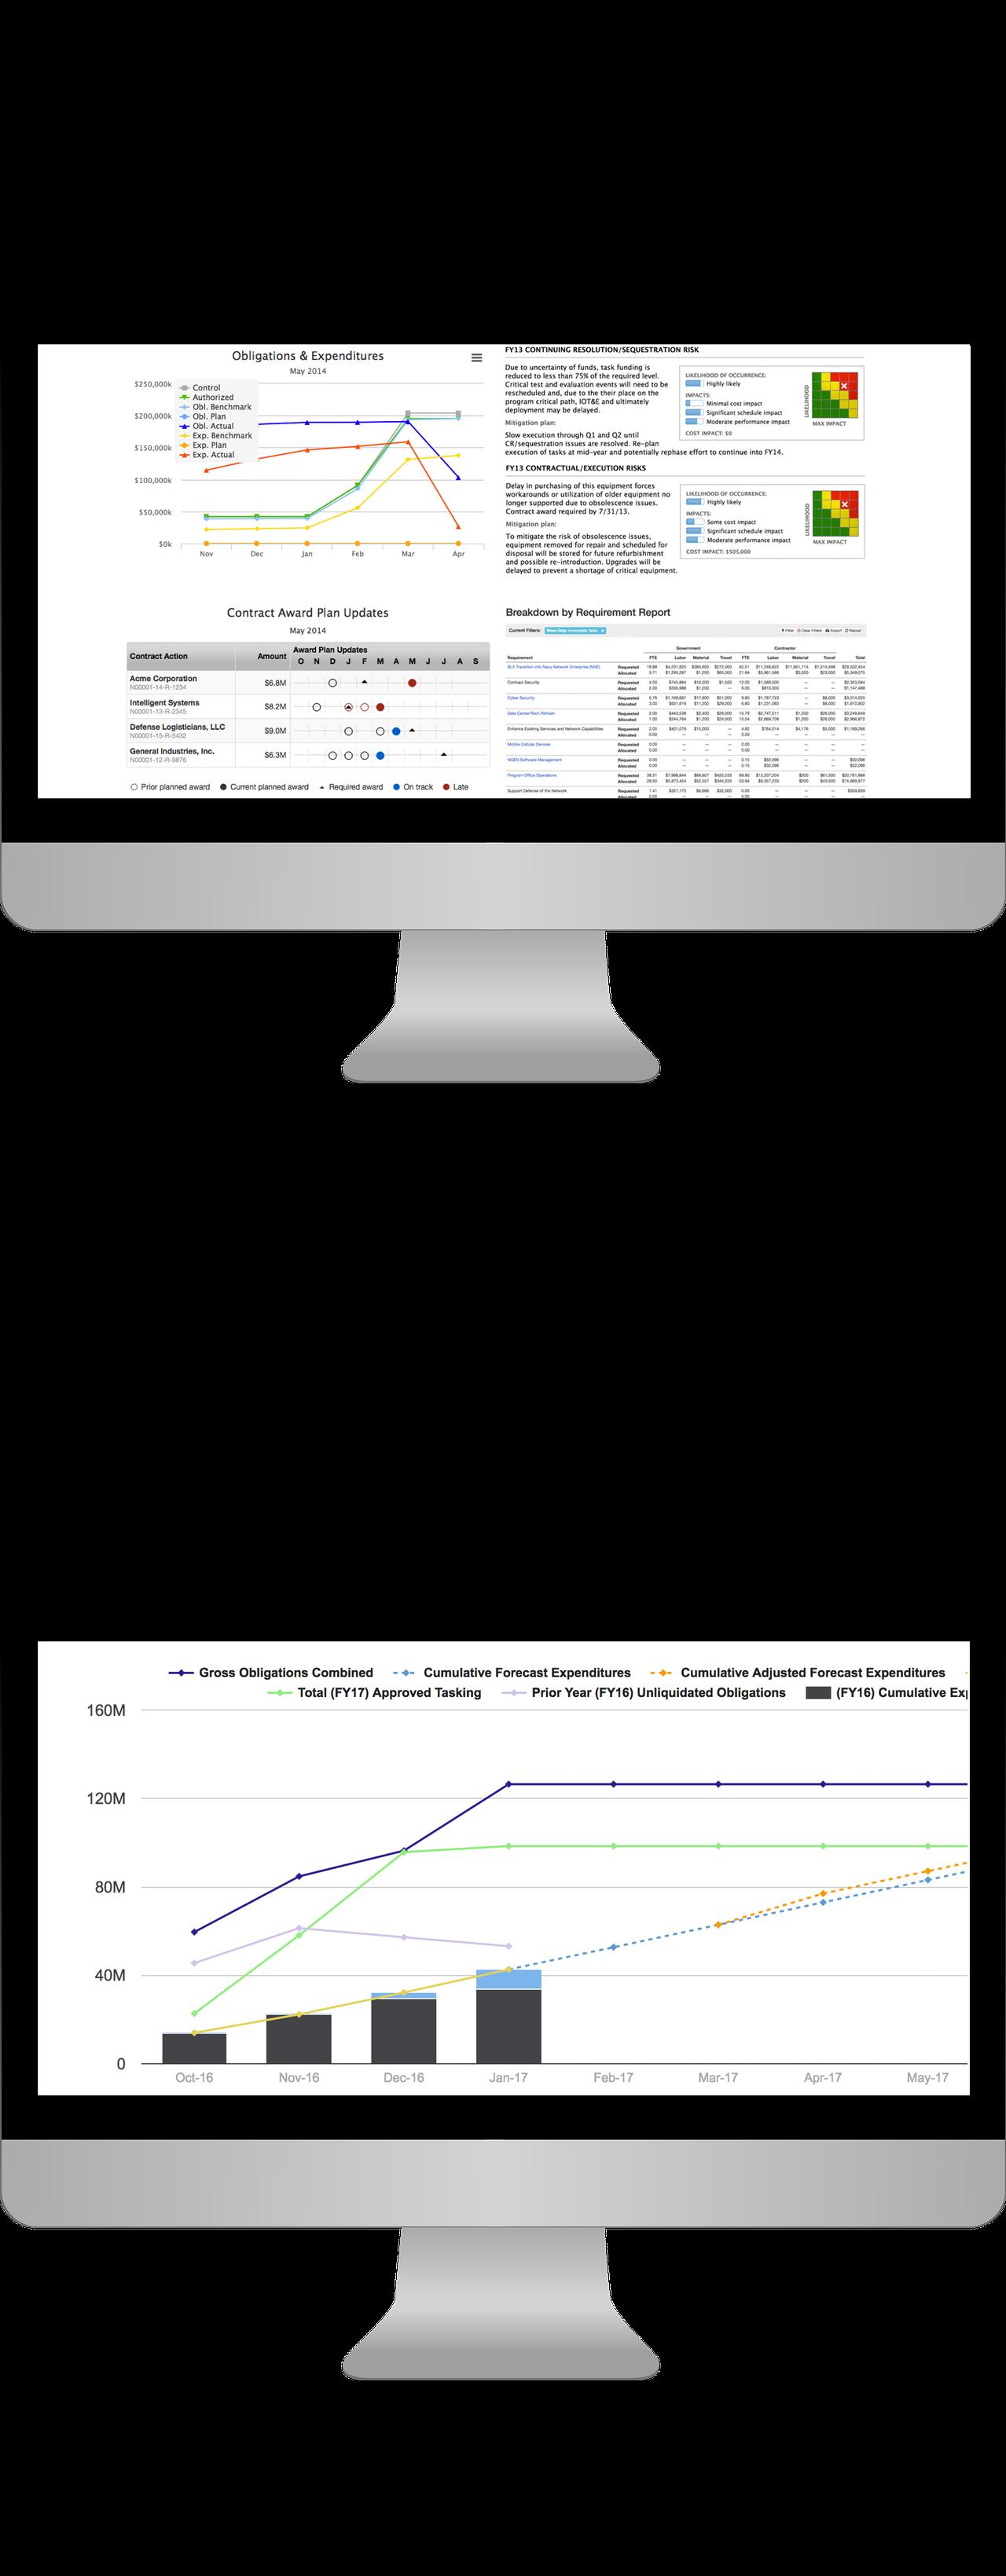 Portfolio & Program Management (PPM) Tools